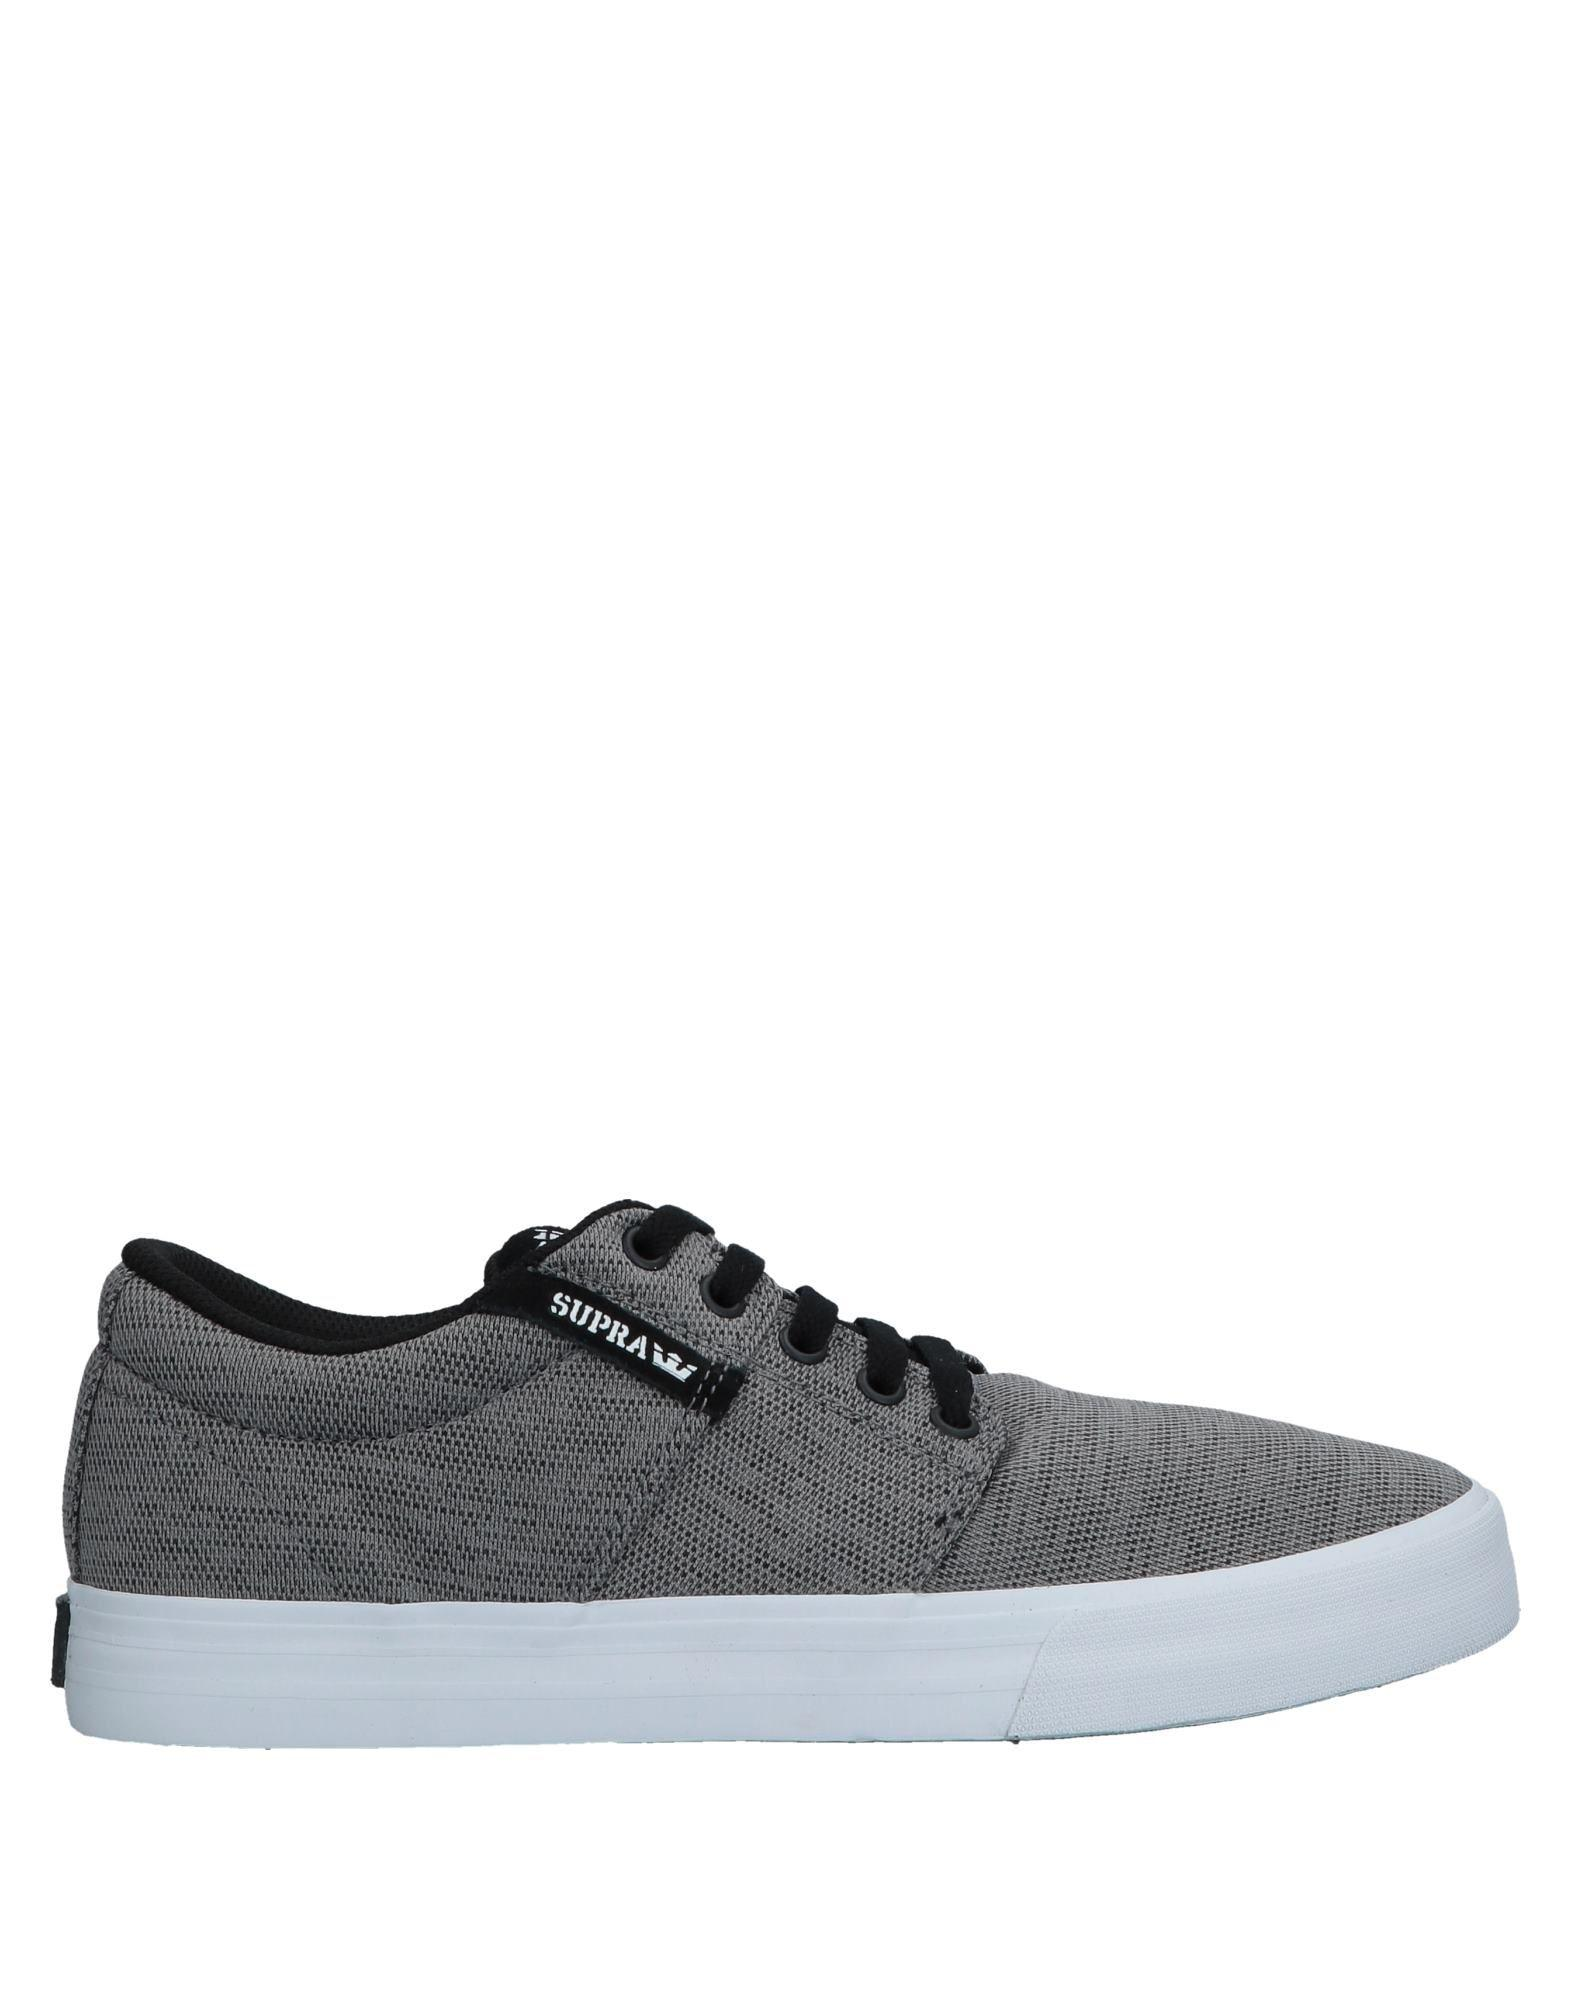 cdb0ee2852 Lyst - Supra Low-tops & Sneakers in Gray for Men